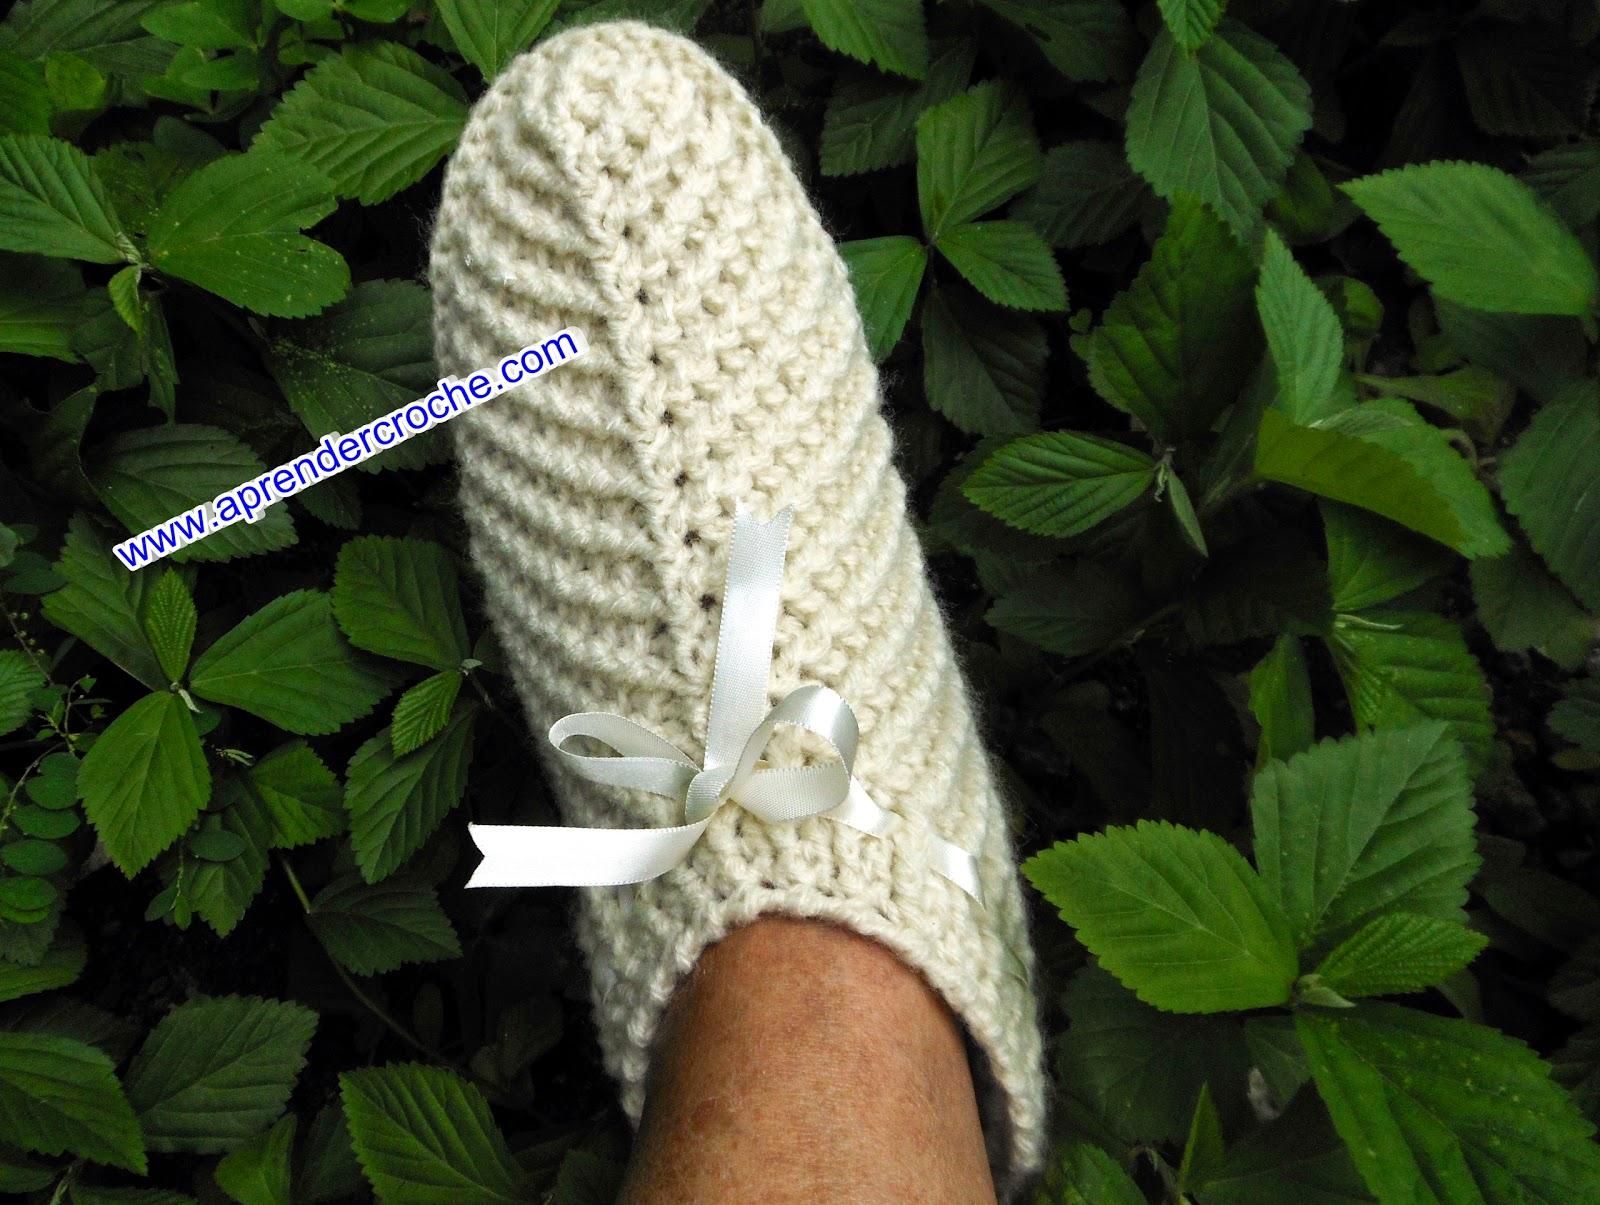 aprrender croche com pantufas amore mollet gratis disponivel dvd na loja curso de croche frete gratis edinir-croche